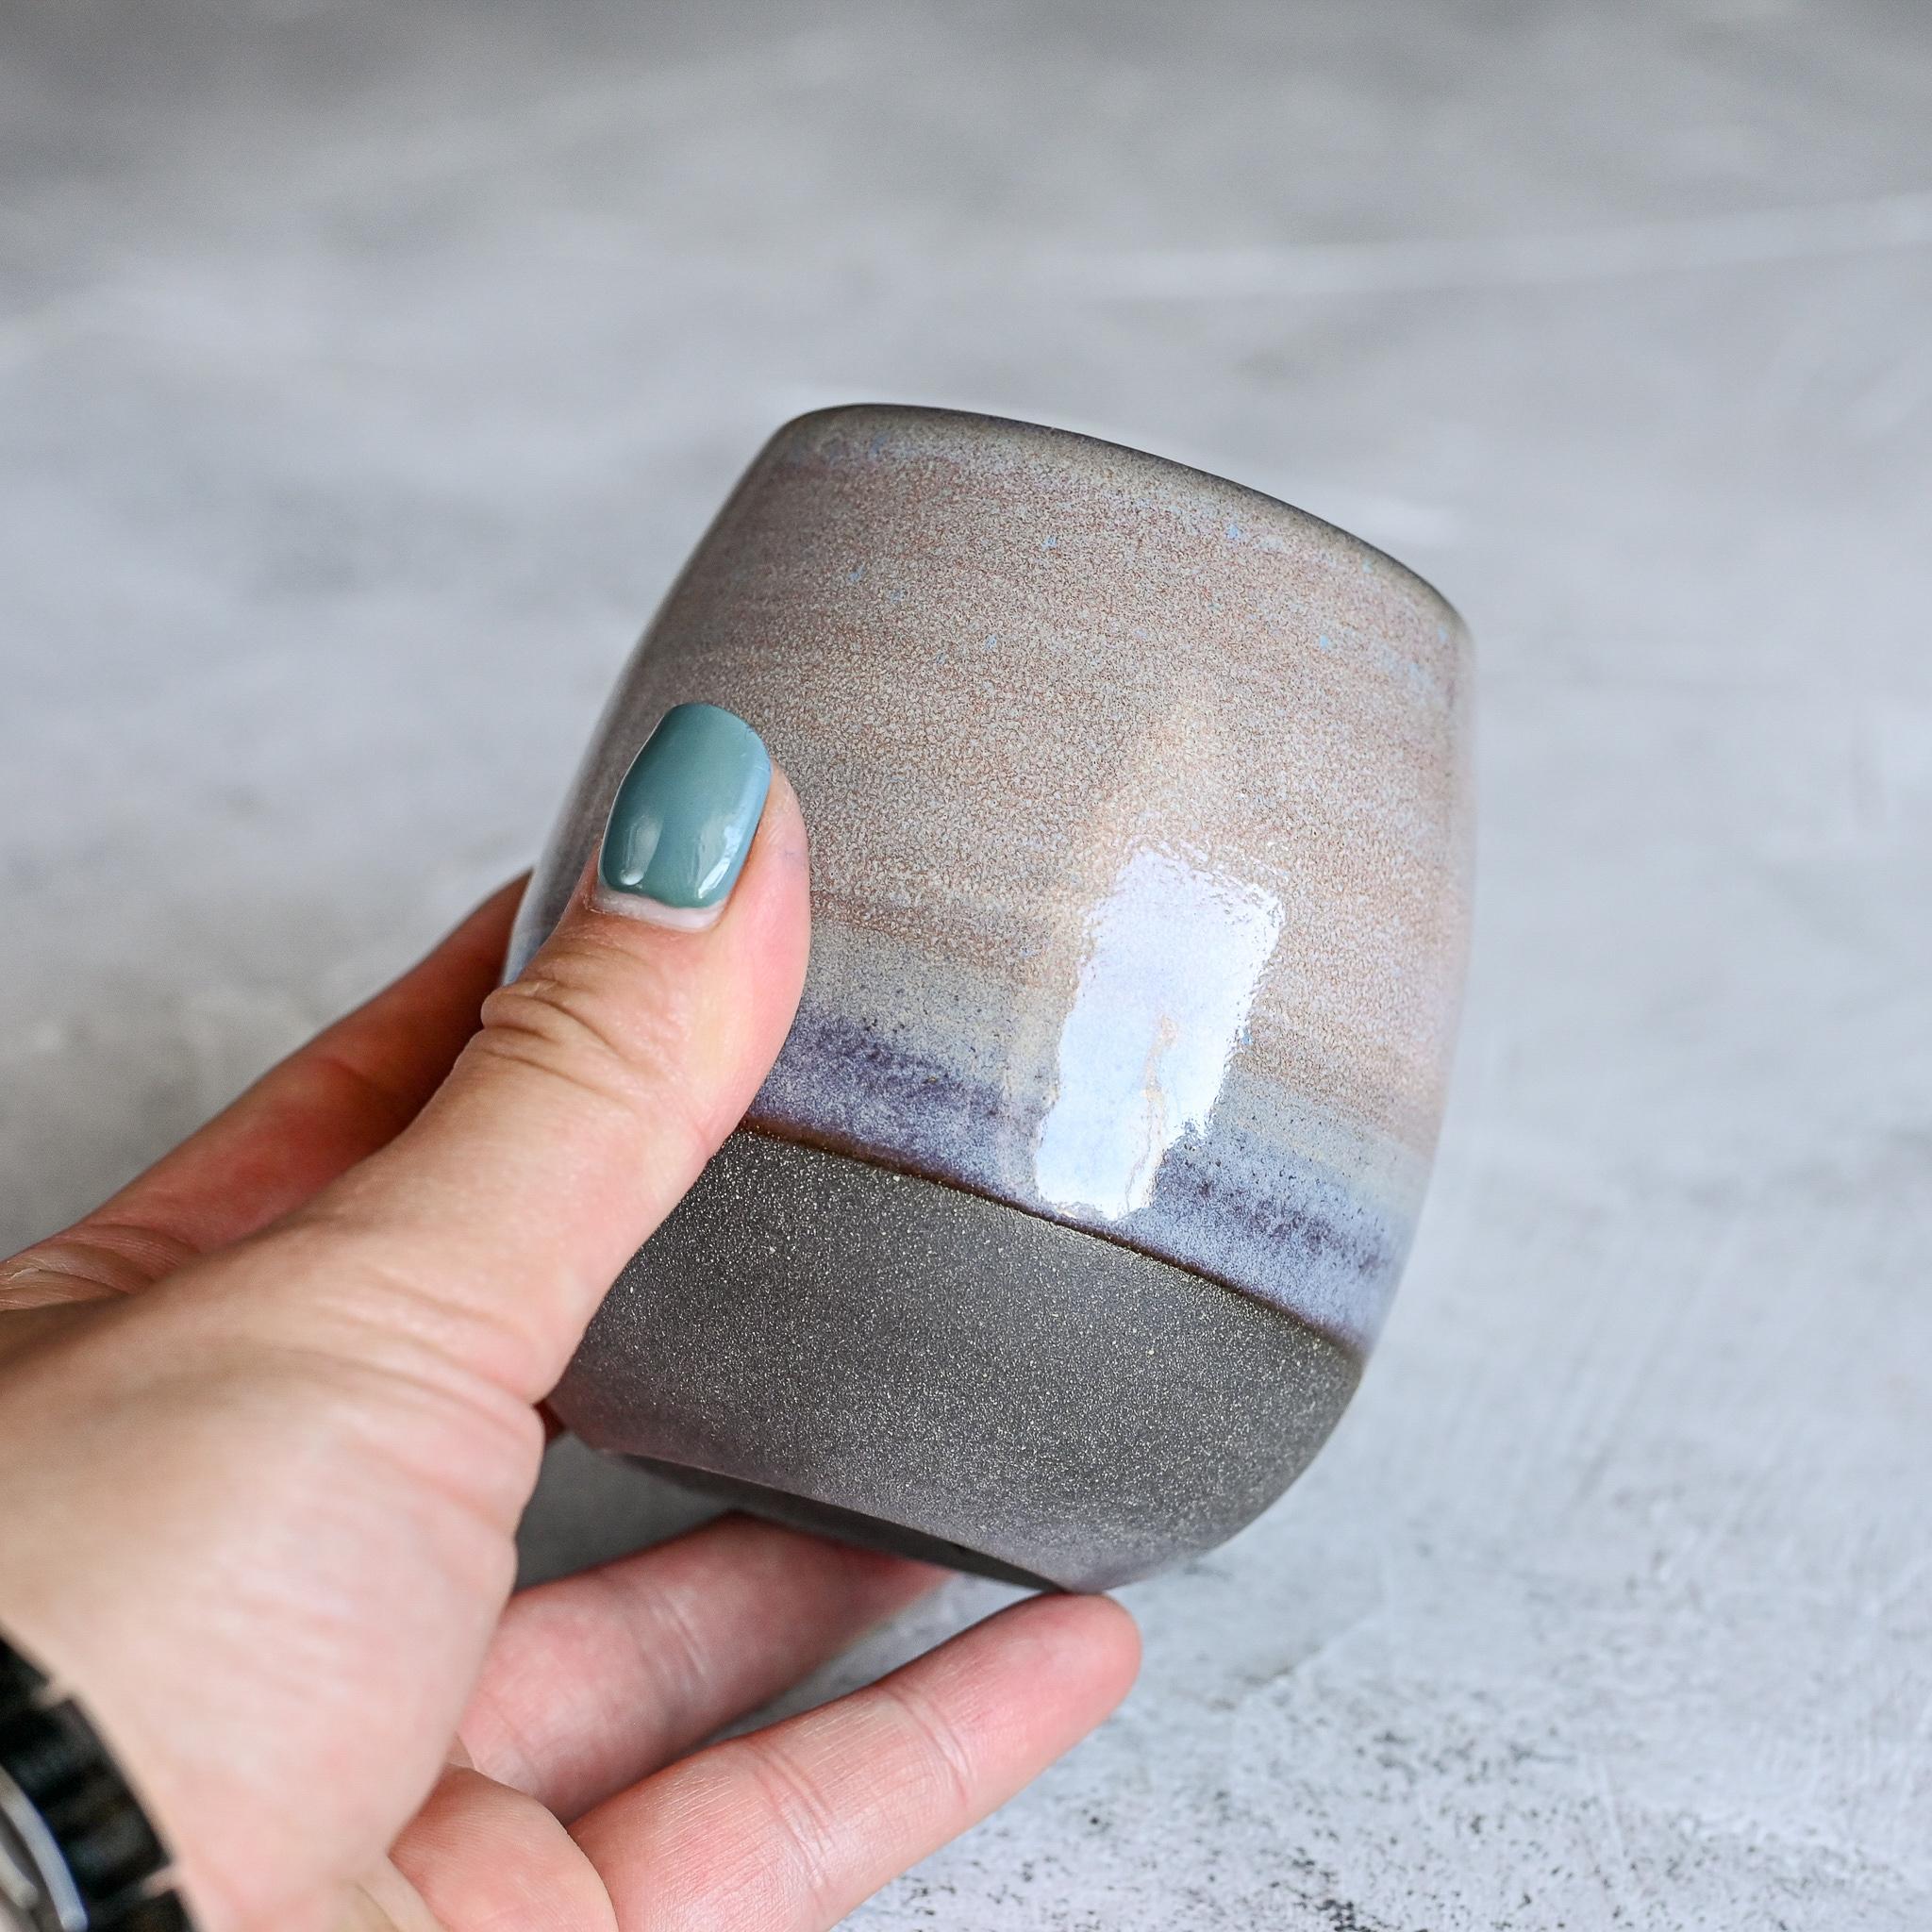 картинка Керамический стакан Марии Левиной малый 3 - DishWishes.Ru